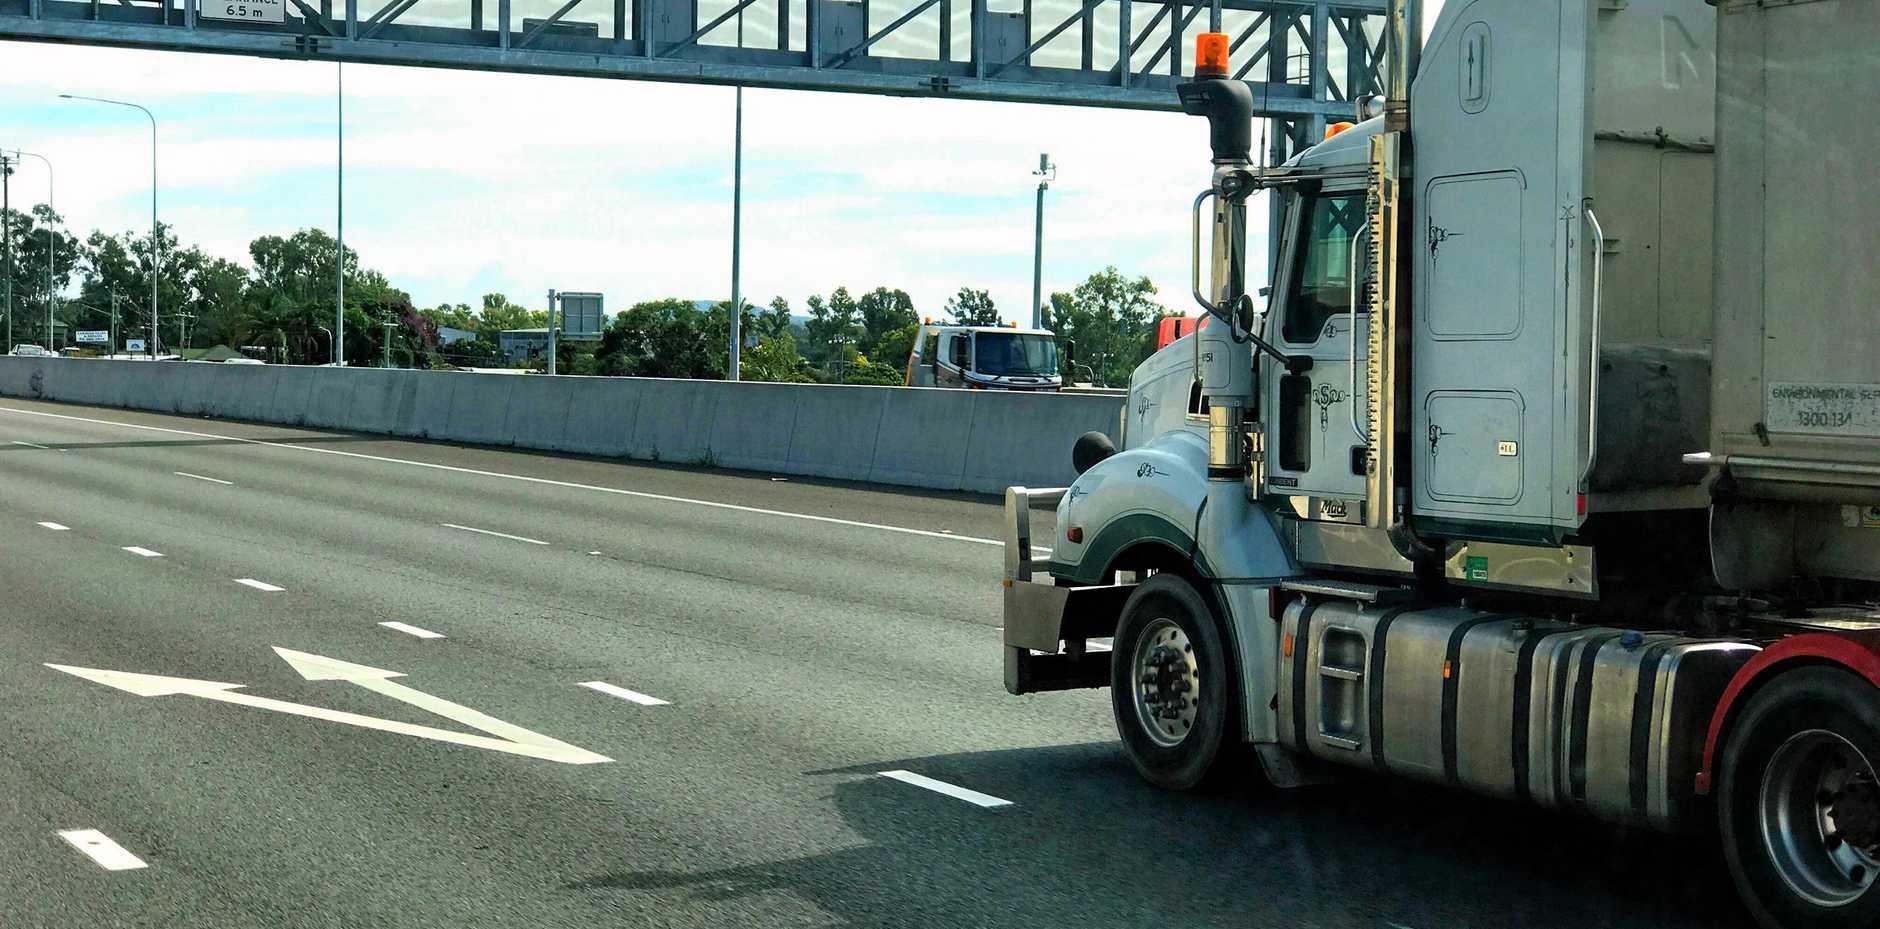 Truck, highway, generic, heavy vehicle, file photo